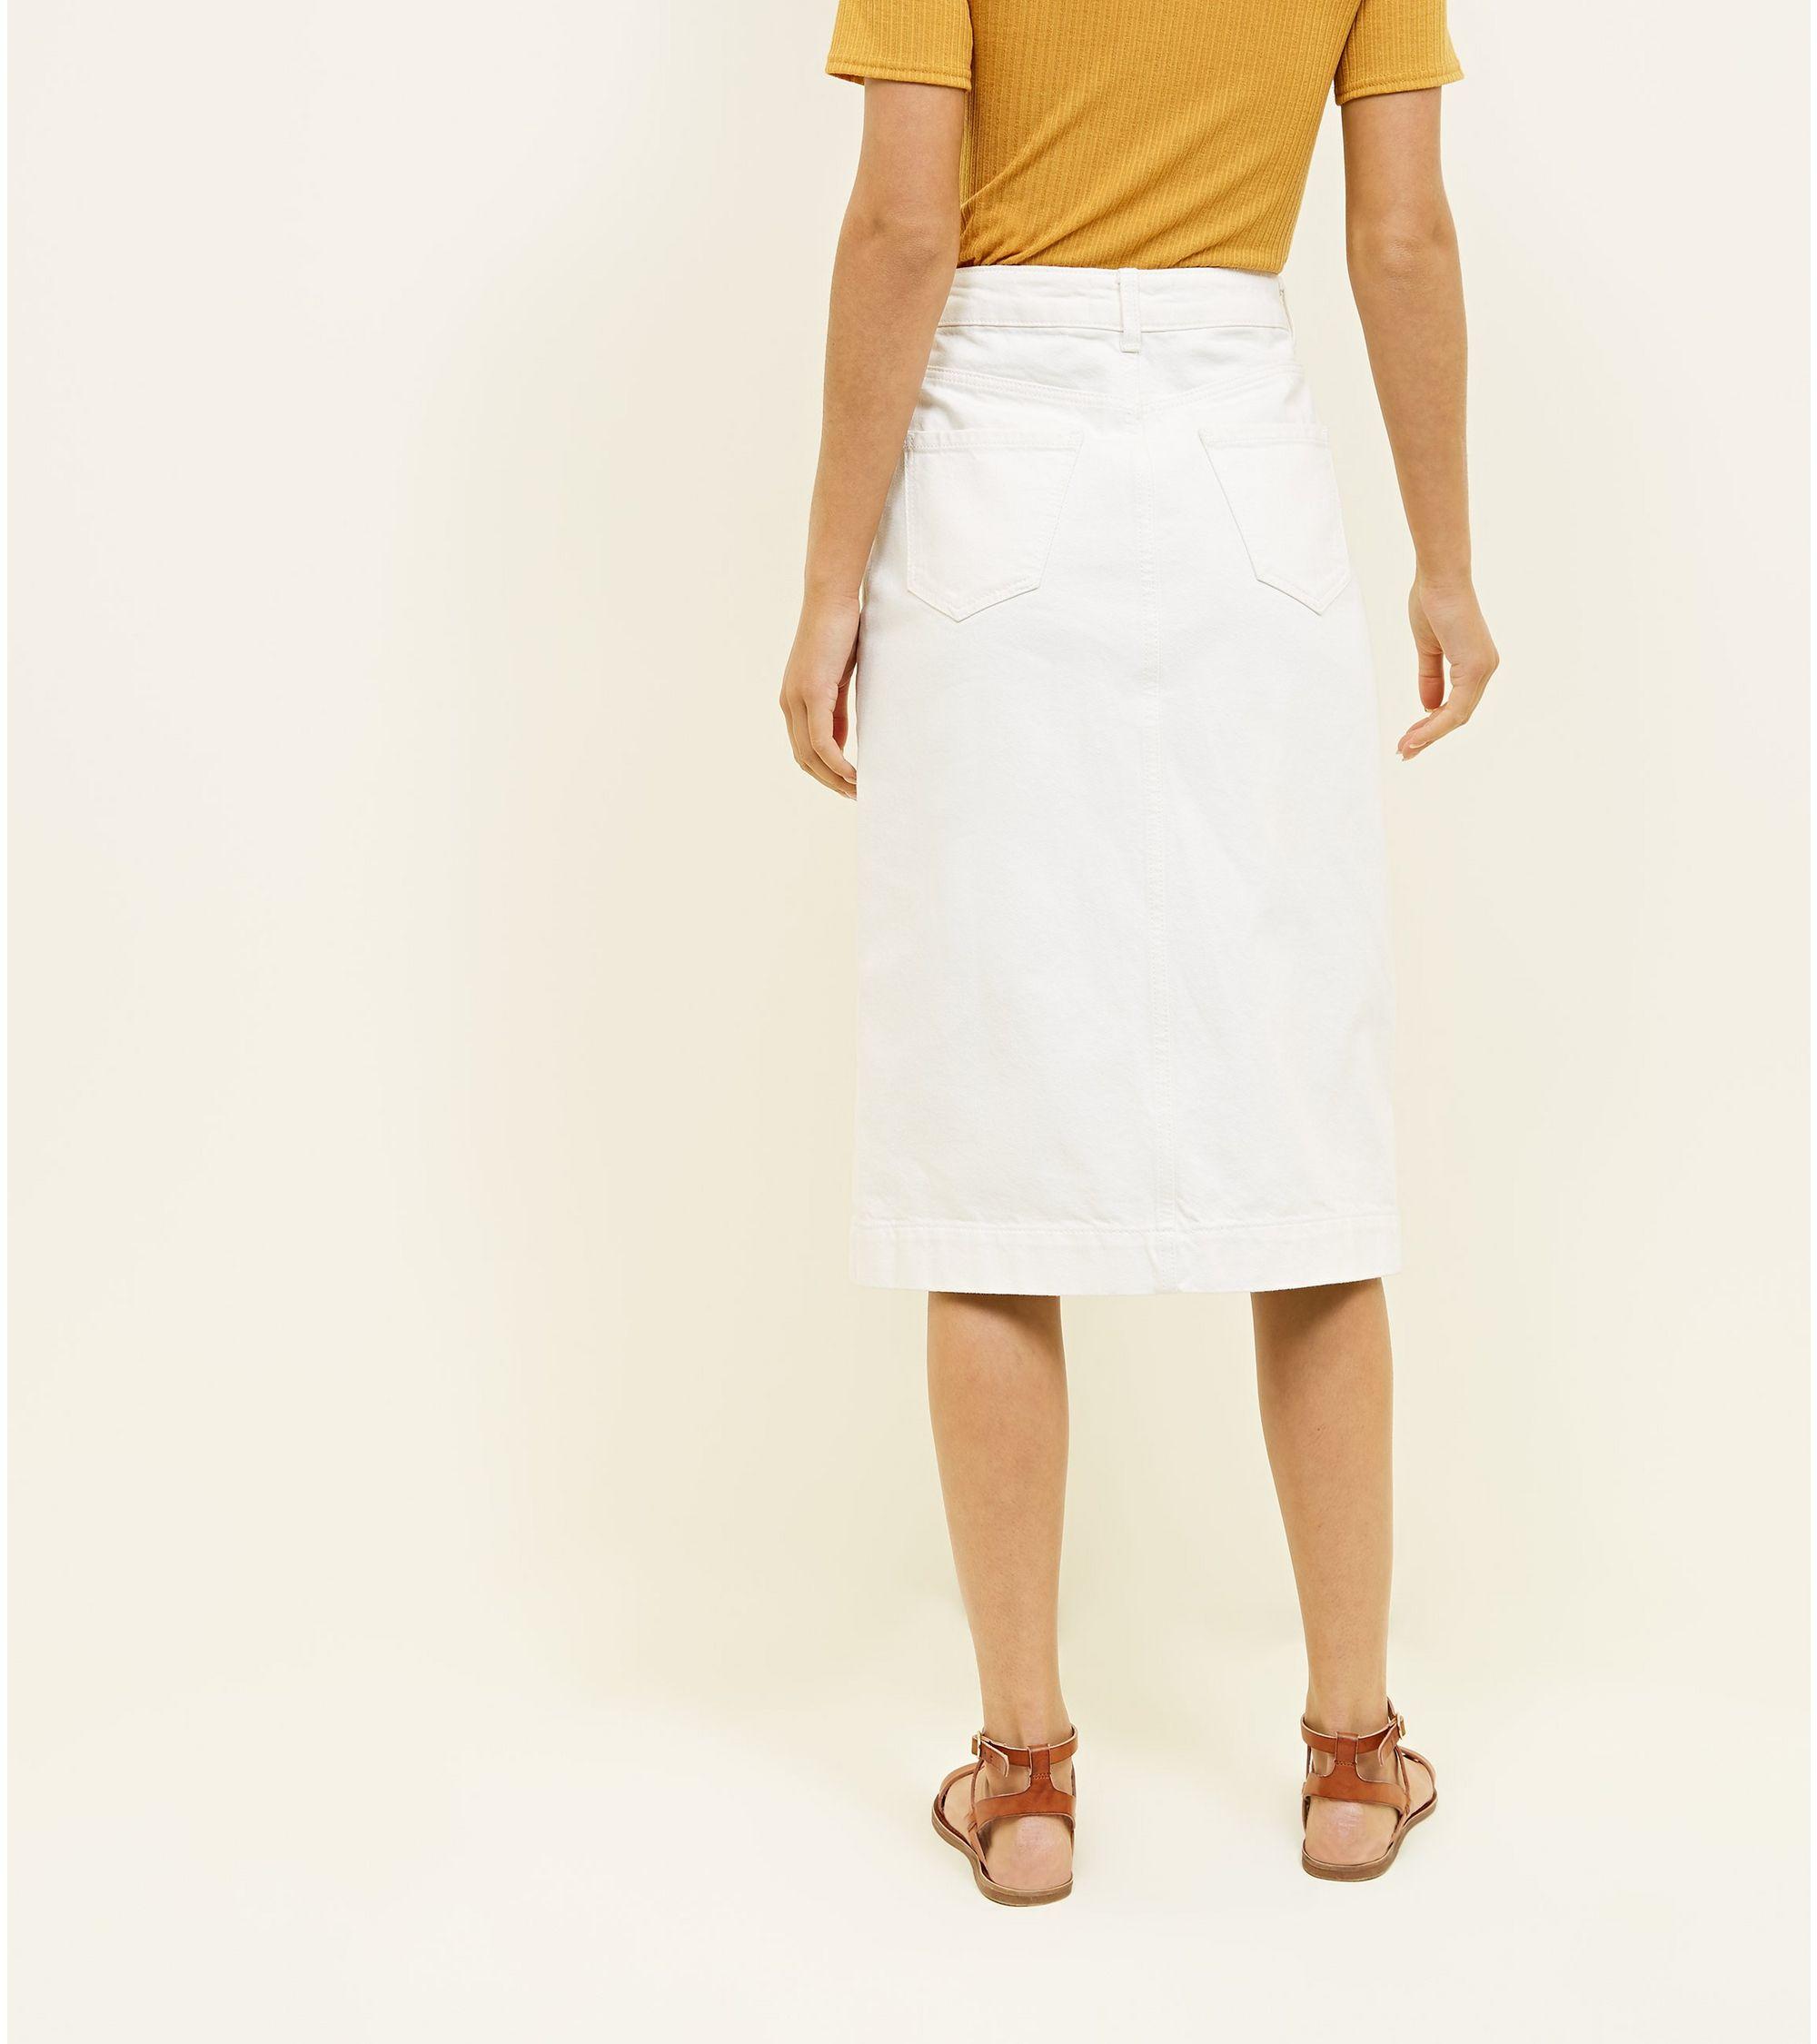 c527eef80a New Look Off White Button Through Denim Midi Skirt at £25.99 | love ...